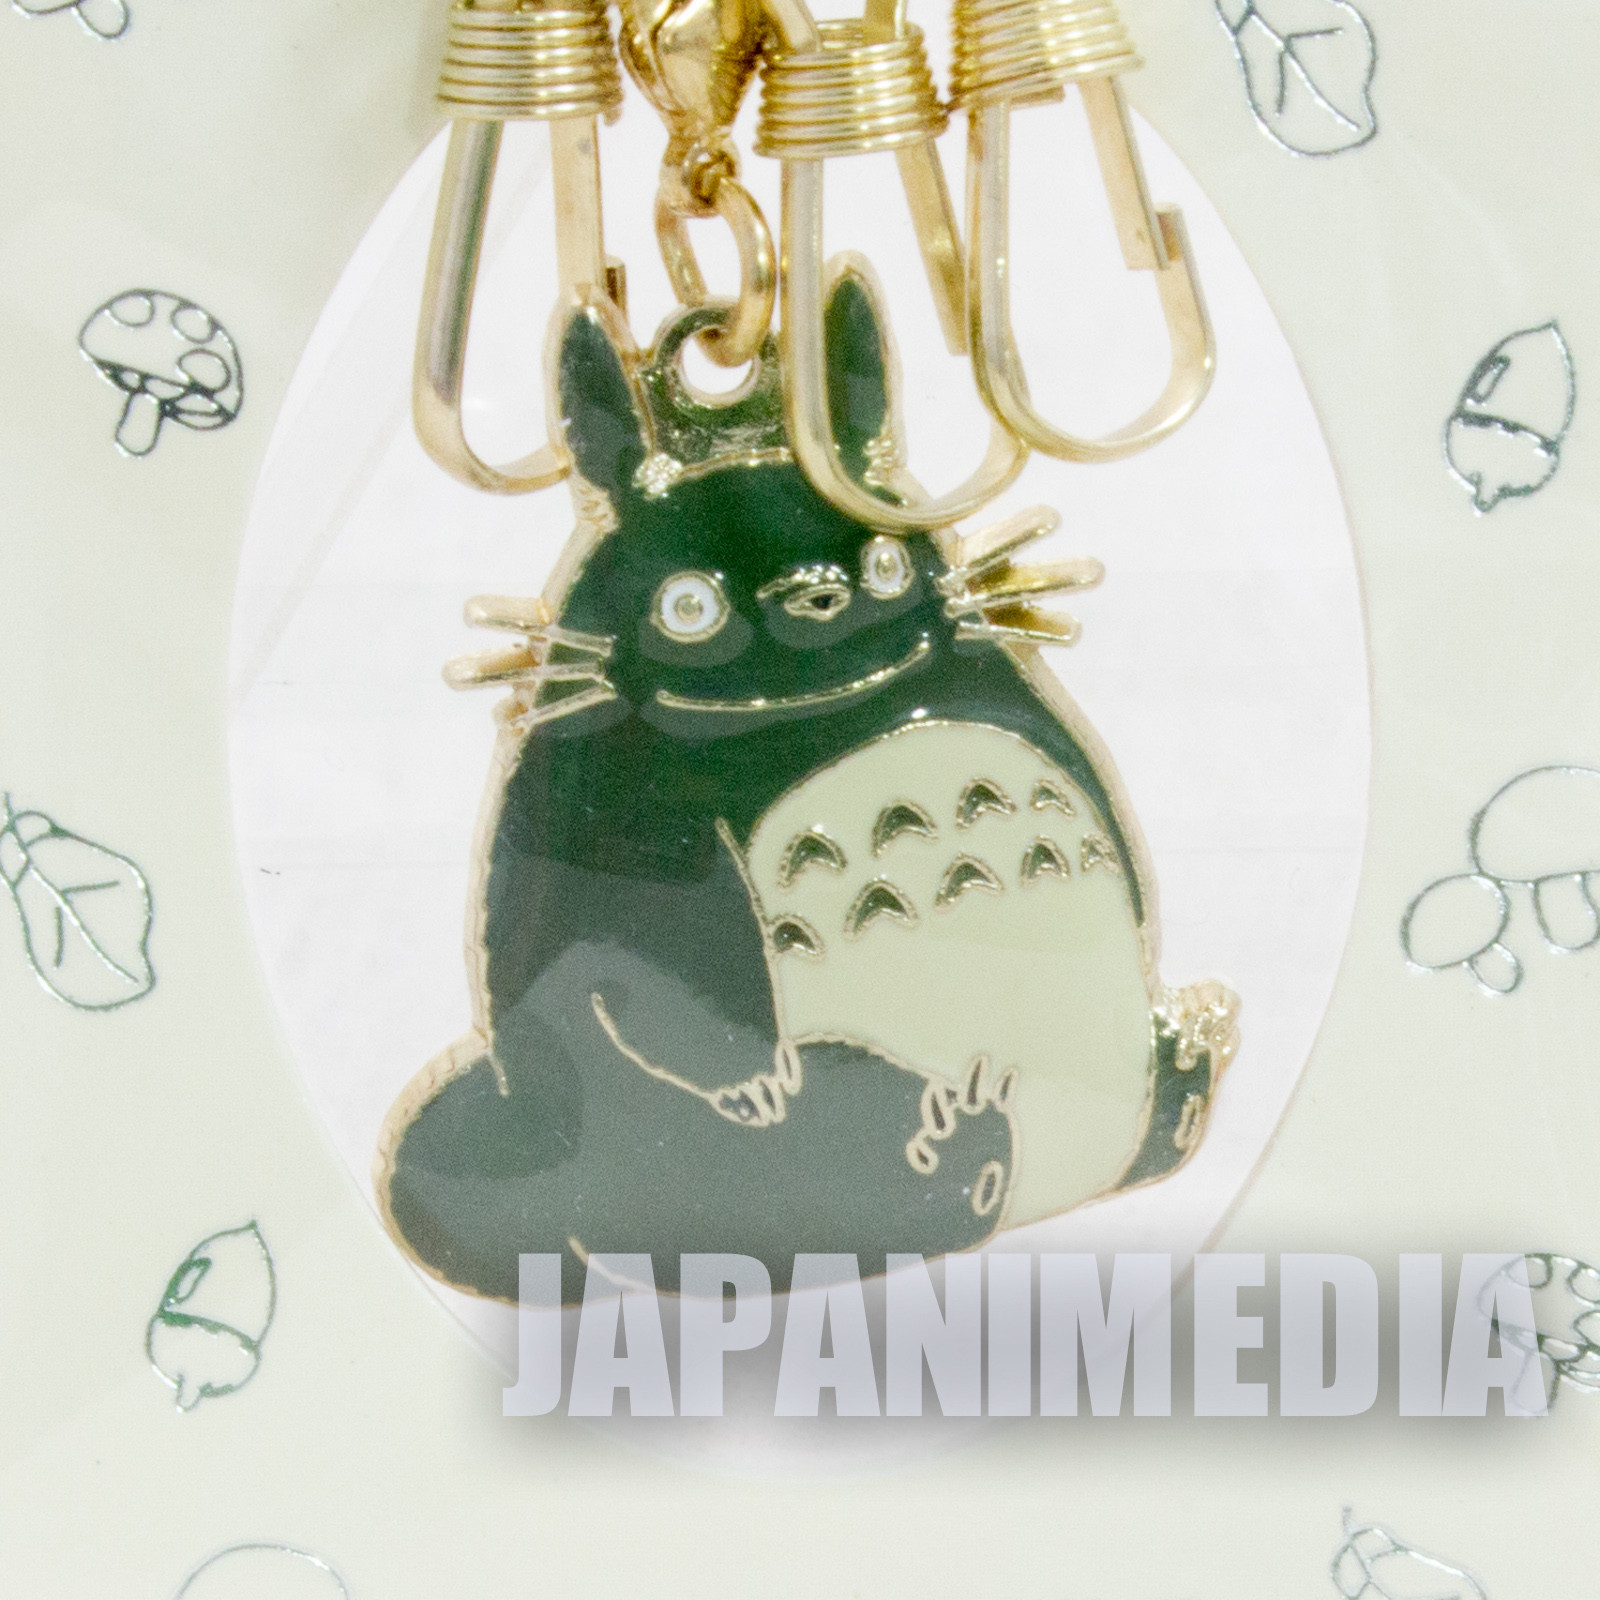 My Neighbor Totoro Mascot Charm Key Ring #1 Ghibli Hayao Miyazaki JAPAN